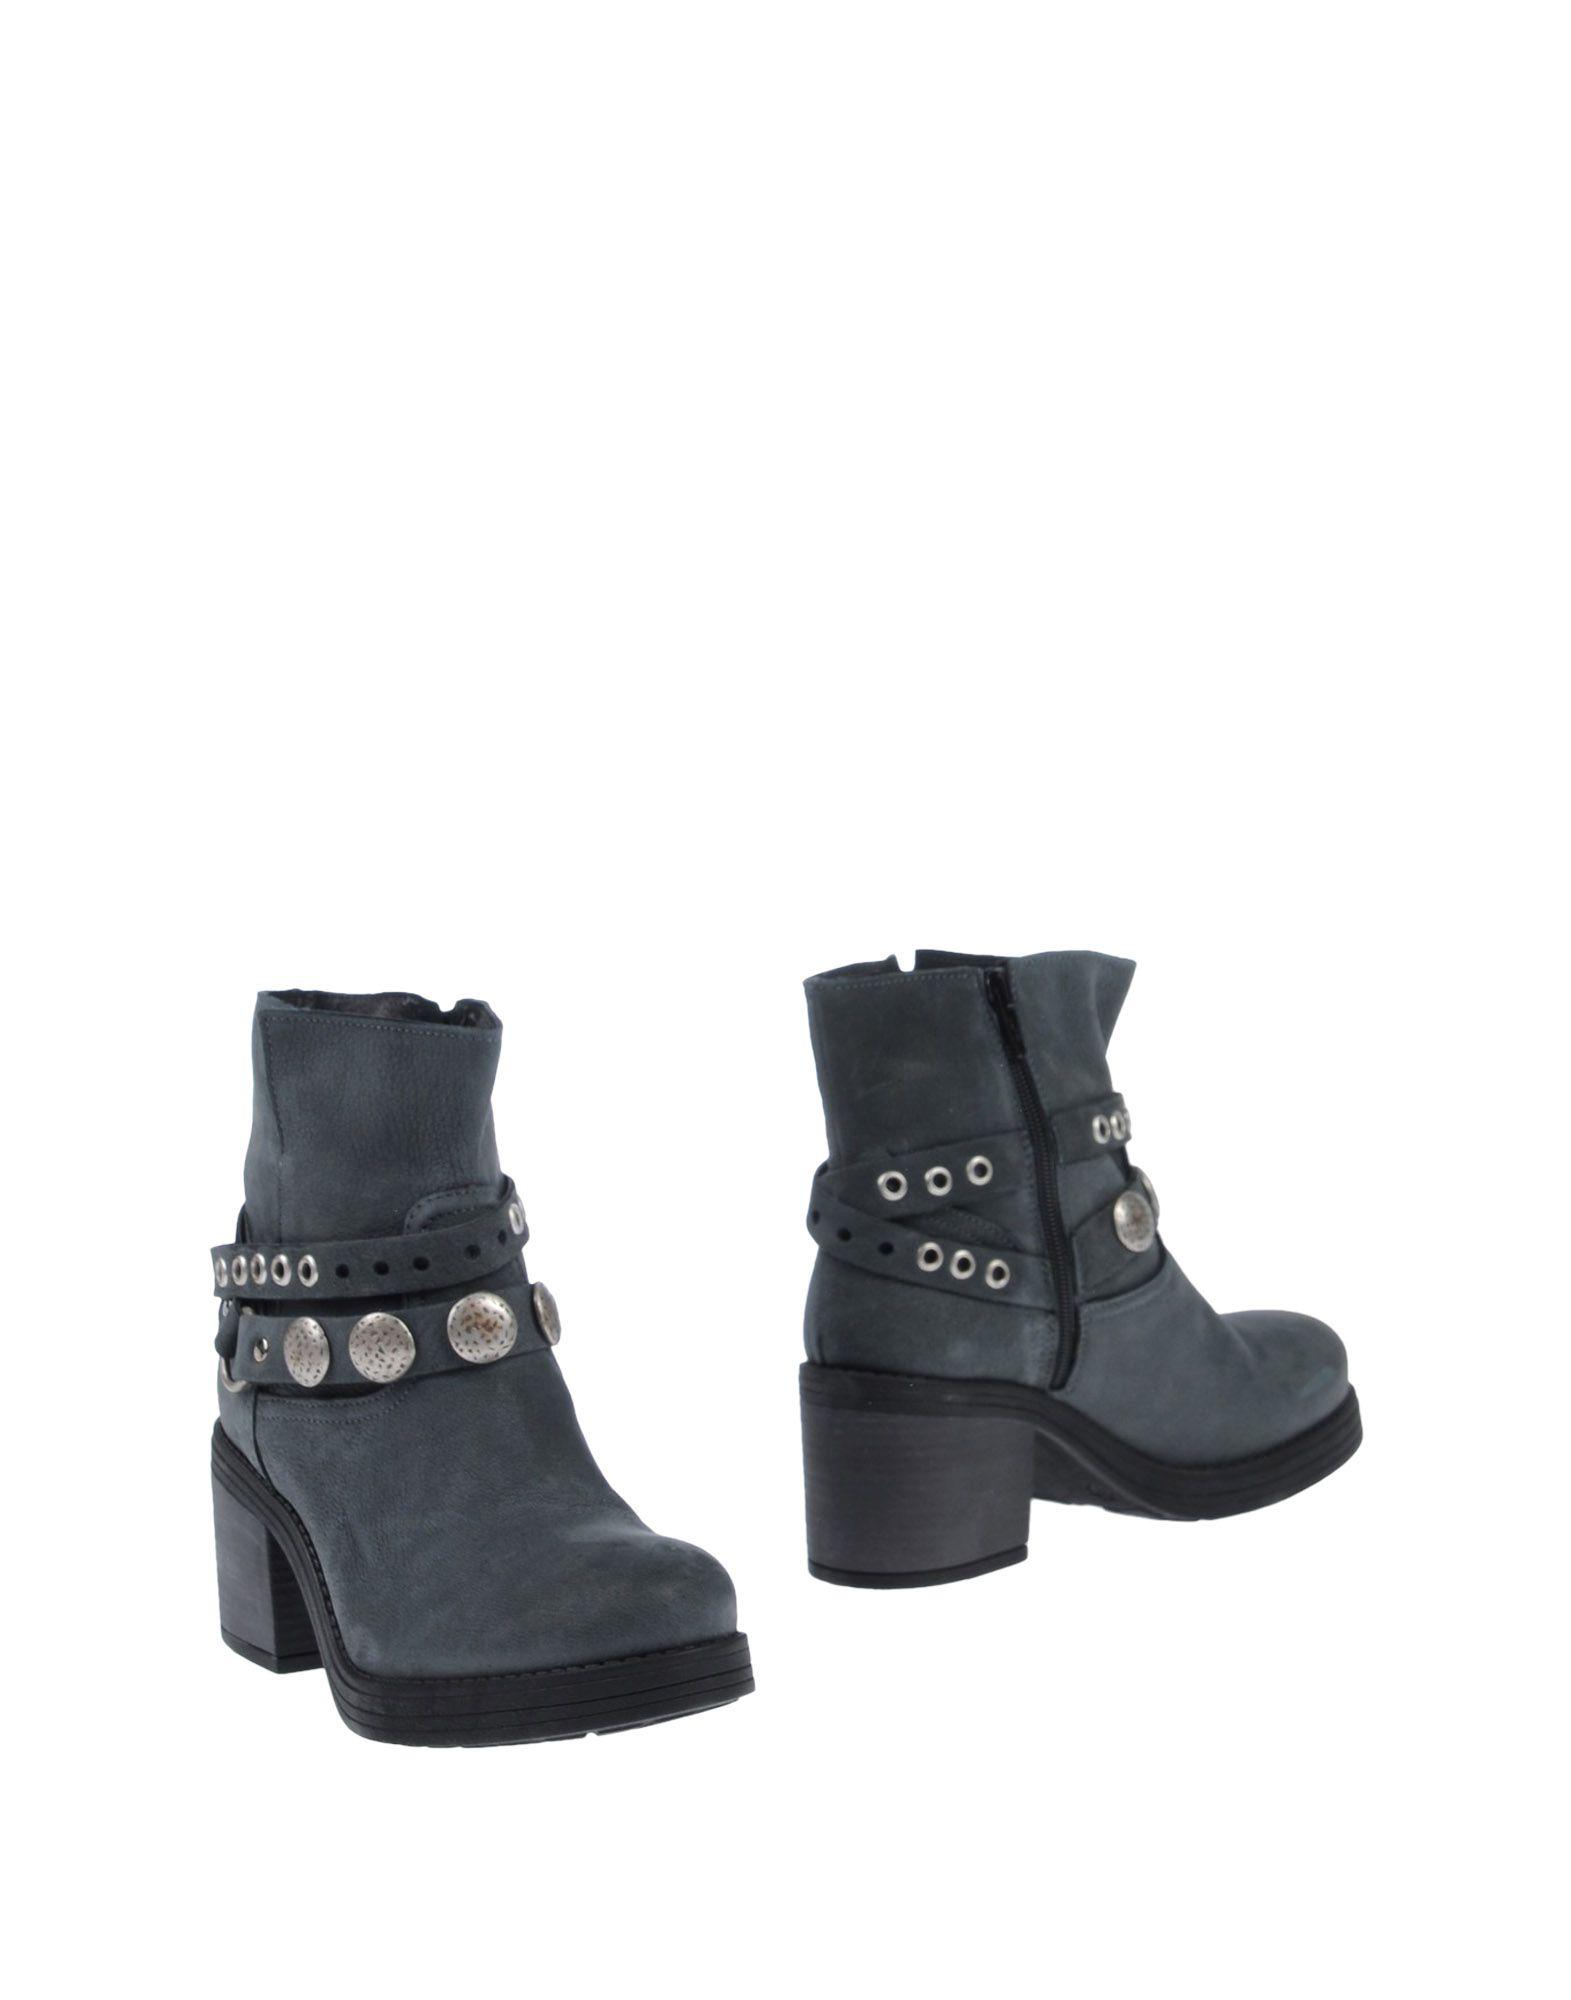 Laura Bizzarri Gute Stiefelette Damen  11486078VU Gute Bizzarri Qualität beliebte Schuhe 47648a